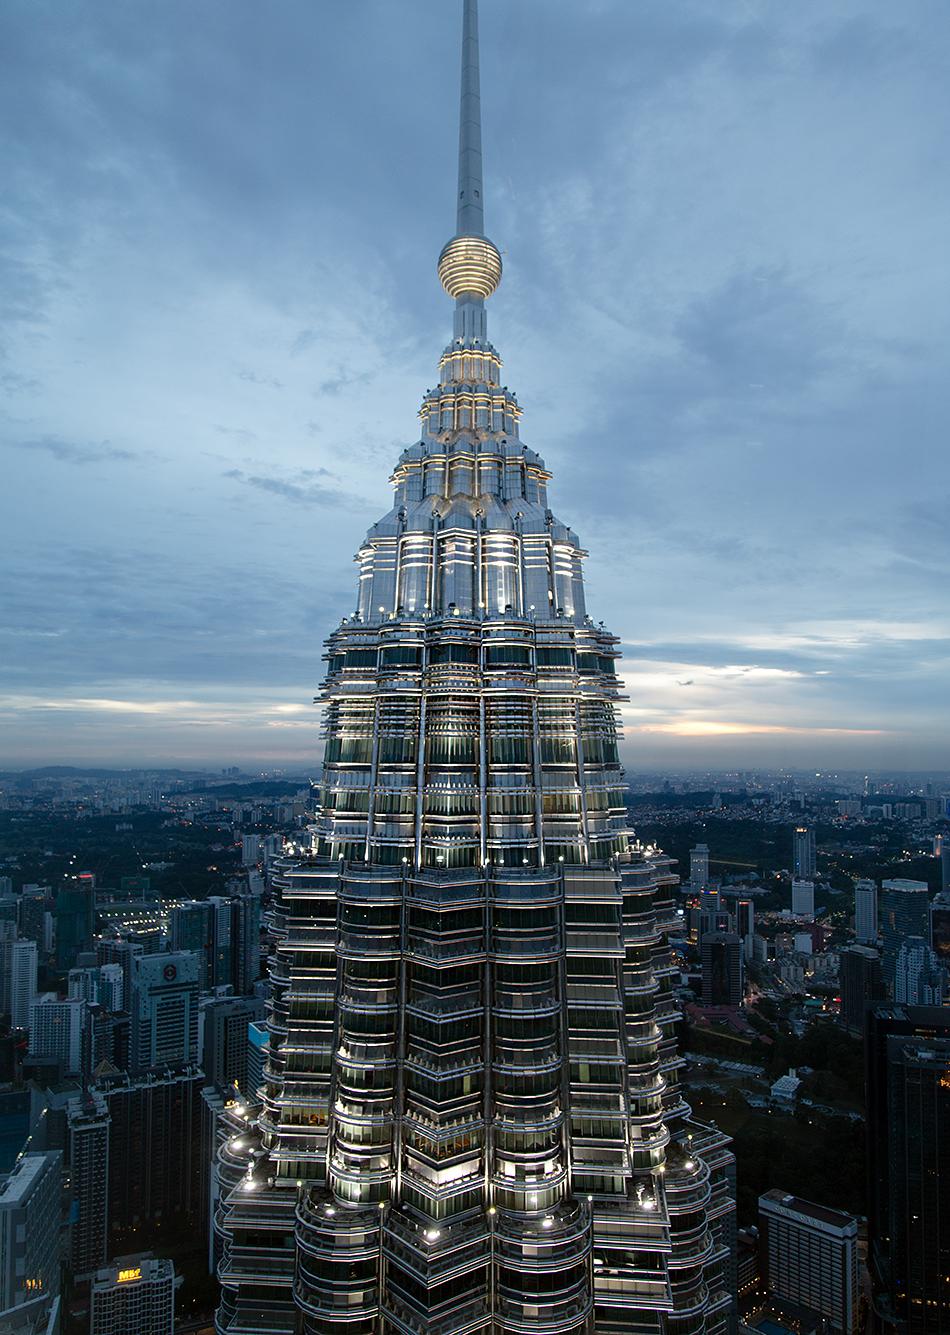 Fabian Fröhlich, Kuala Lumpur, Petronas Twin Towers, Night